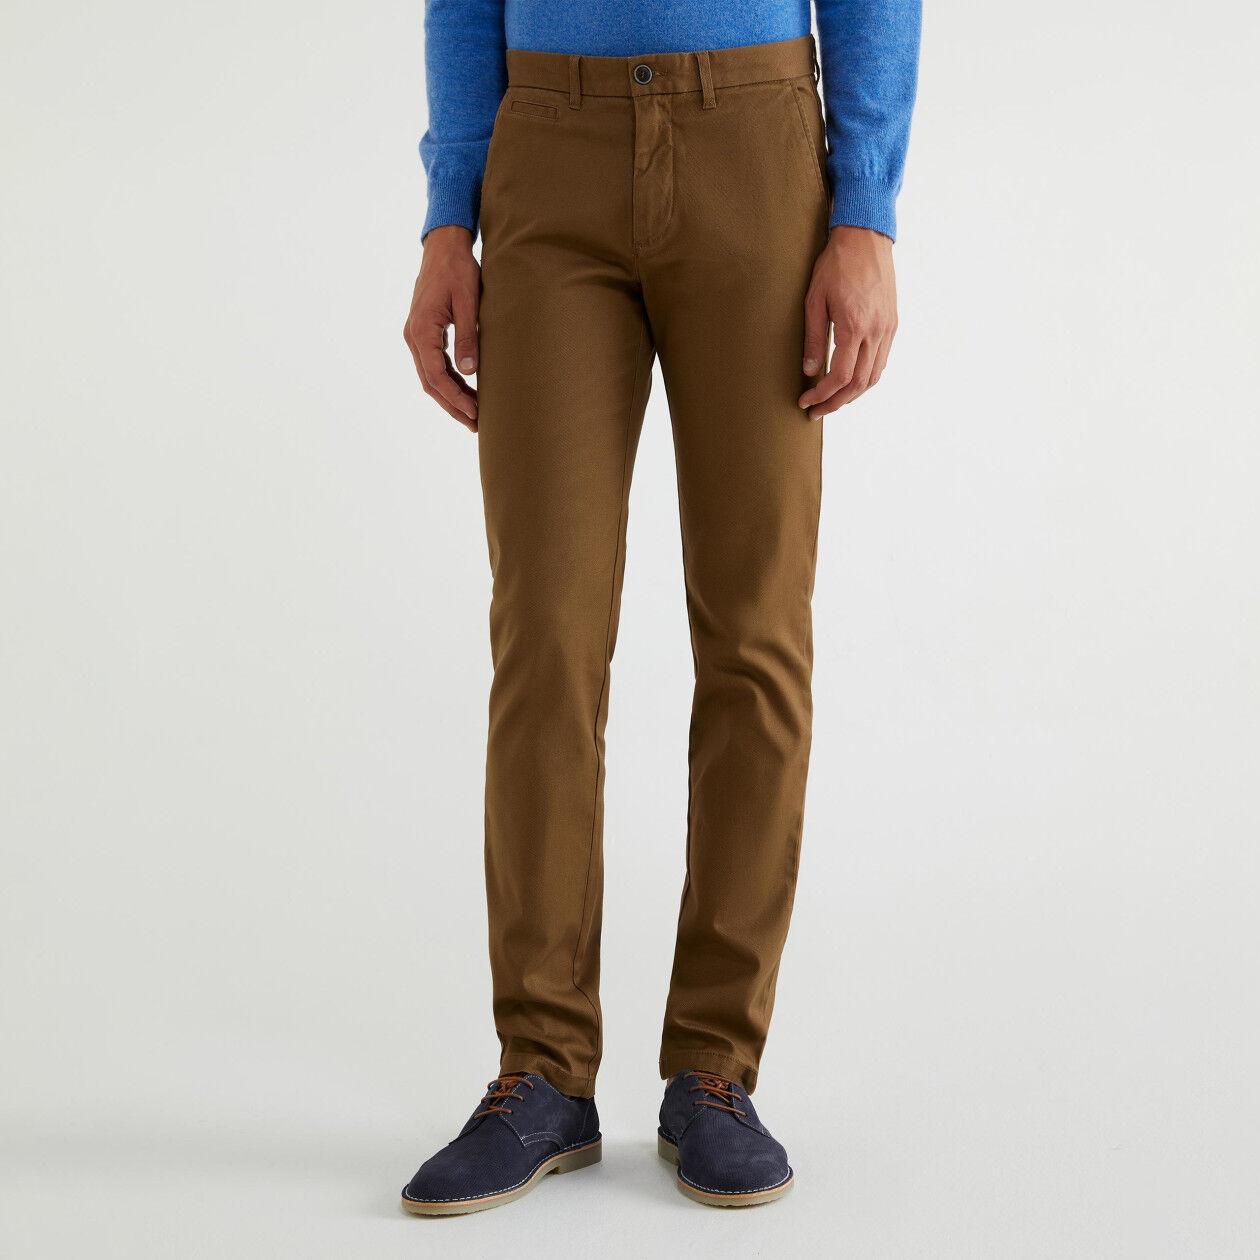 Chino in cotone slim fit